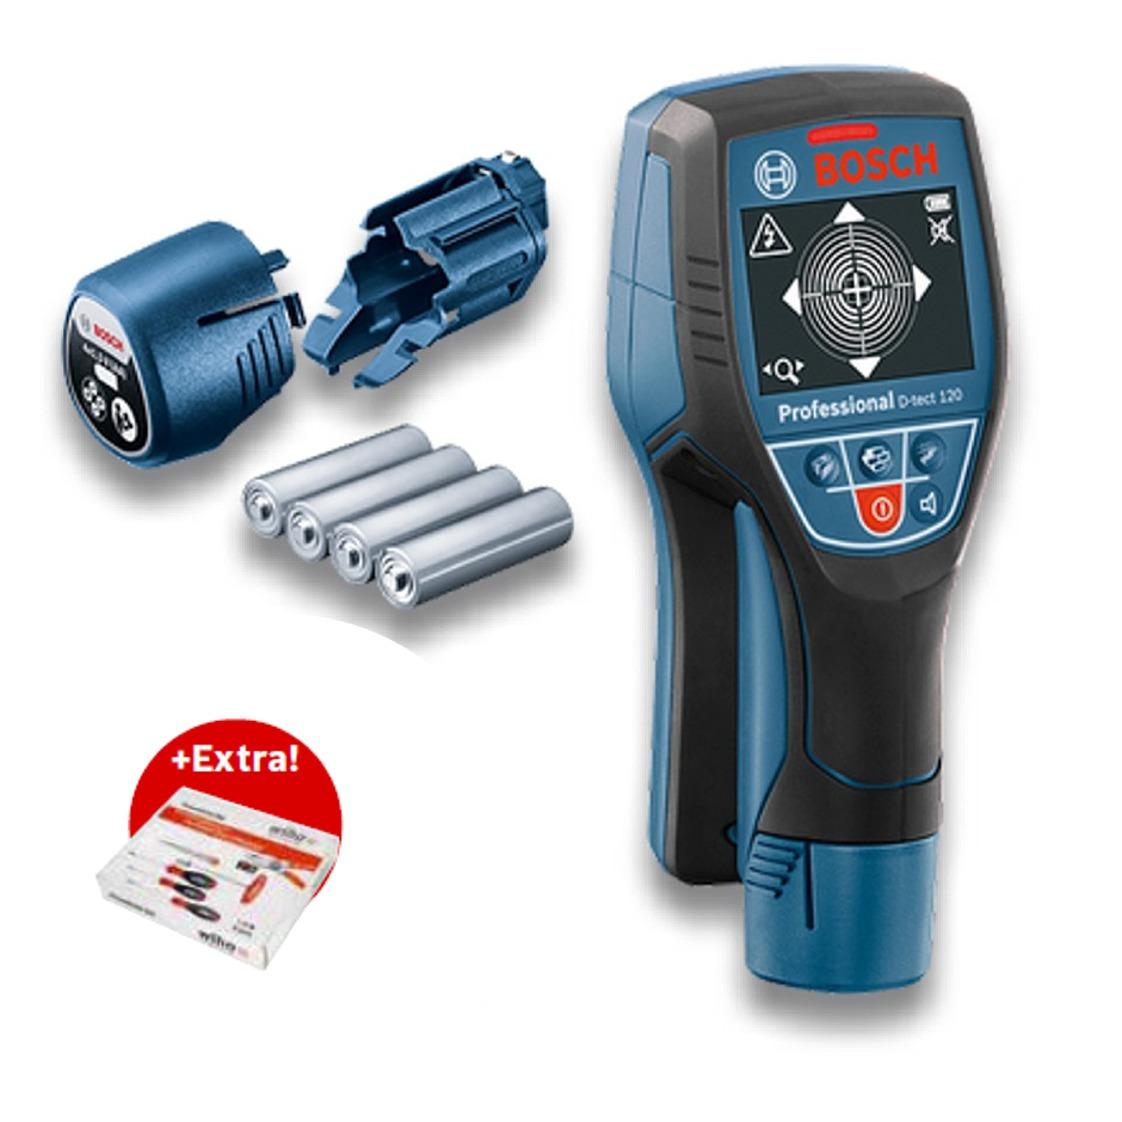 ed96a1c053c9c Bosch Wallscanner D-tect 120 Professional 4x1,5V AA